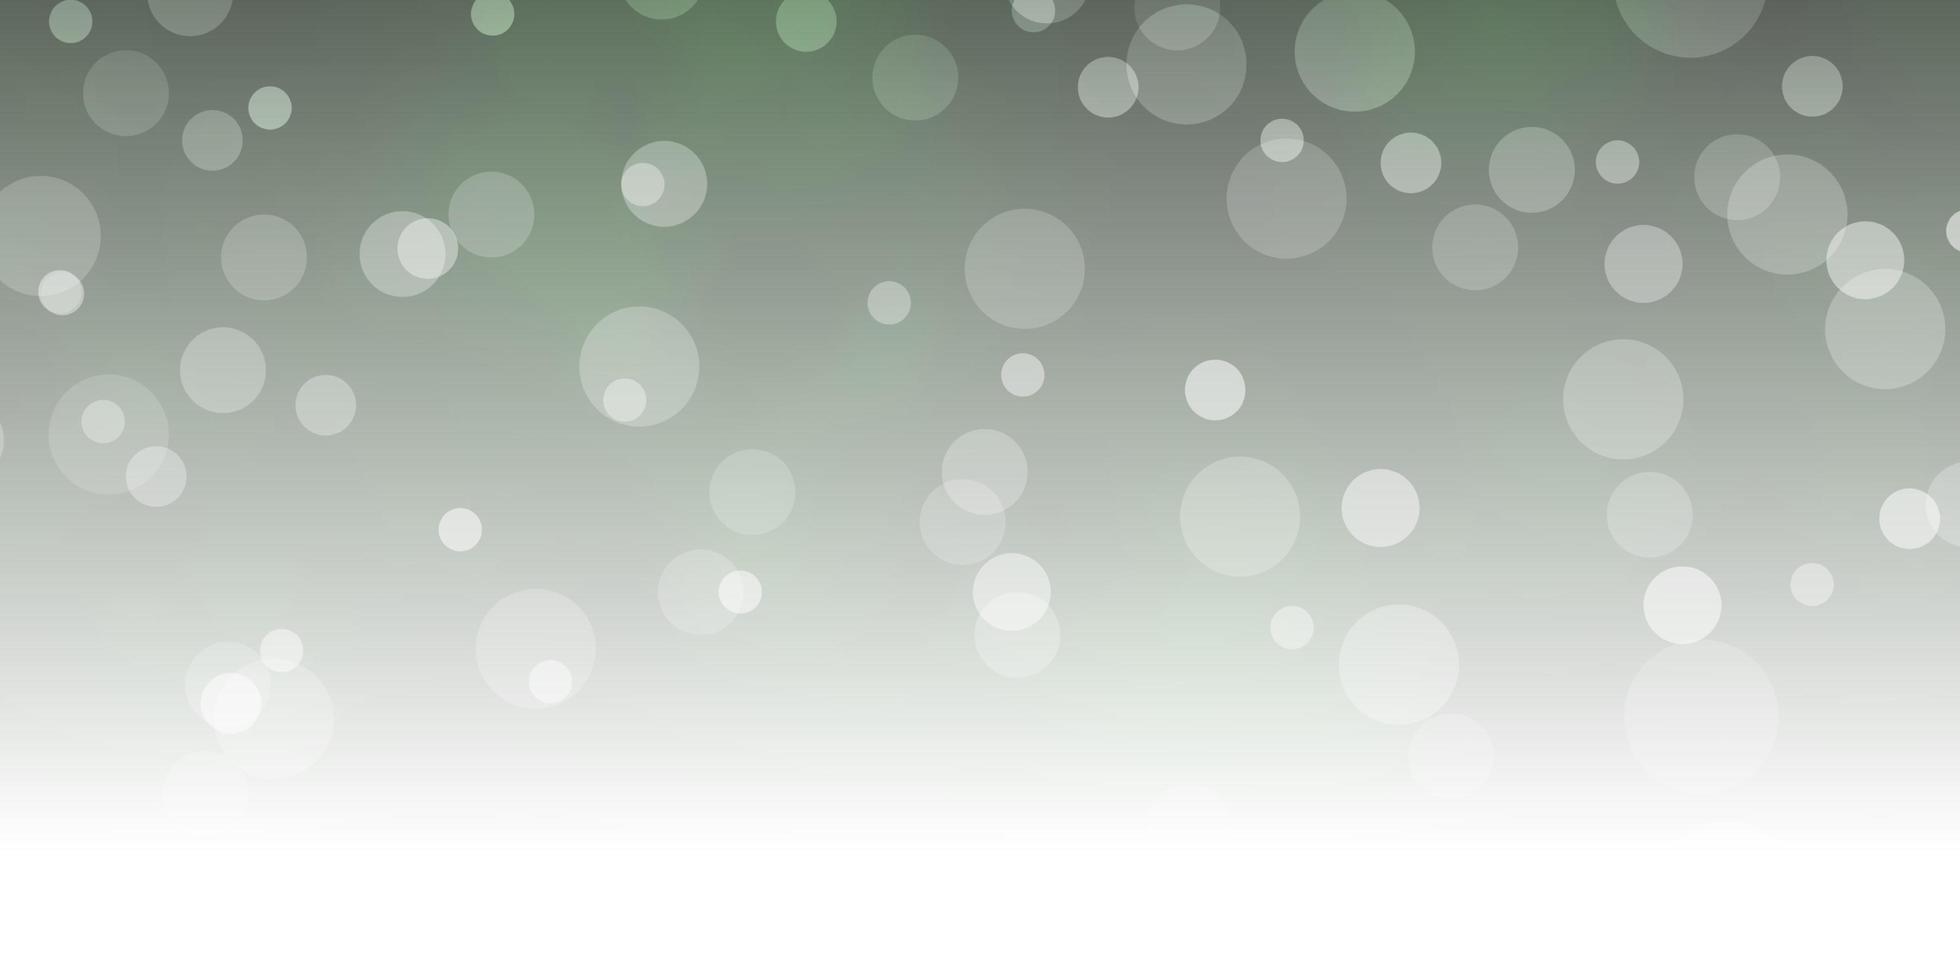 modelo verde escuro com círculos. vetor